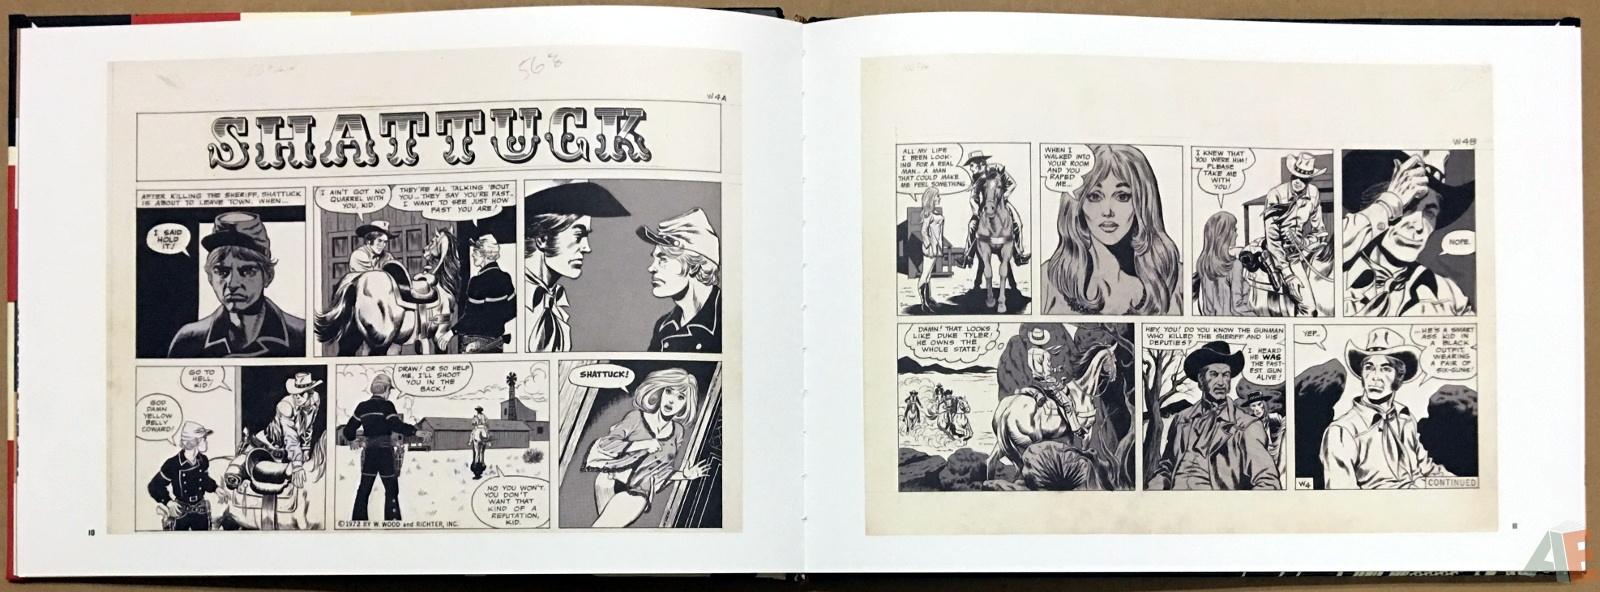 Wallace Wood Presents Shattuck Original Art Edition 10